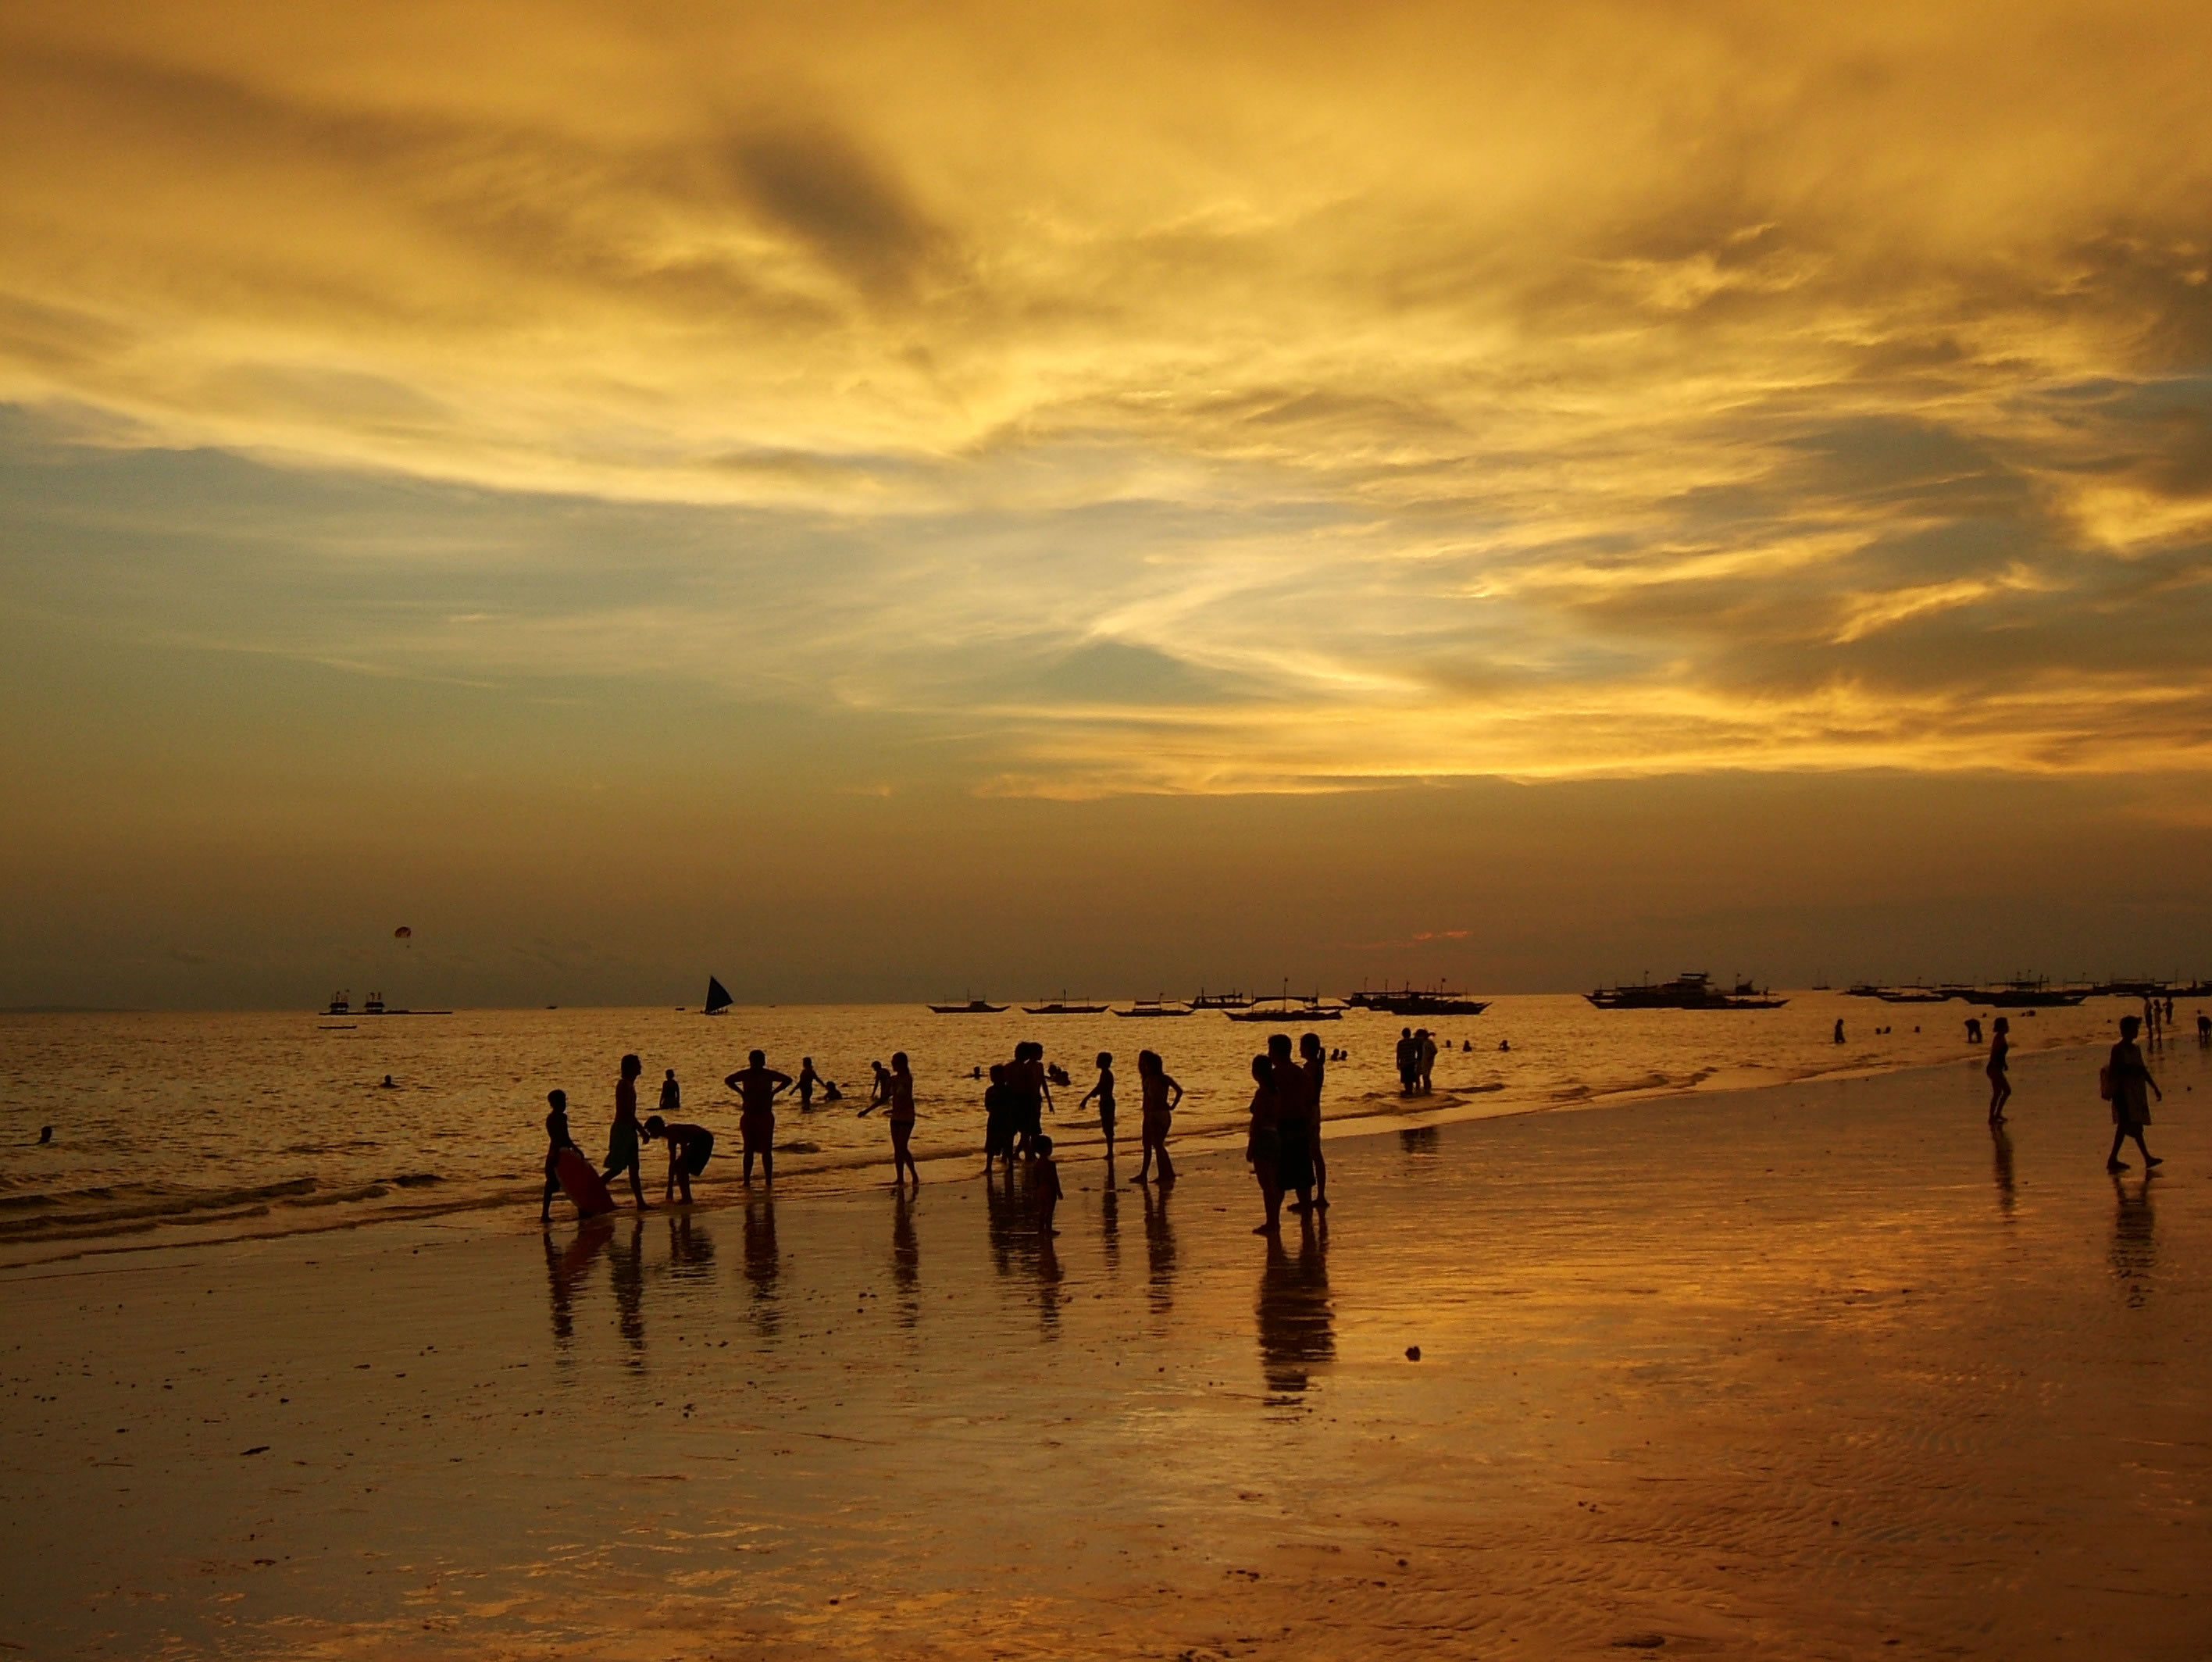 Philippines Sugar Islands Caticlan Boracay White Beach Sunset 2007 33